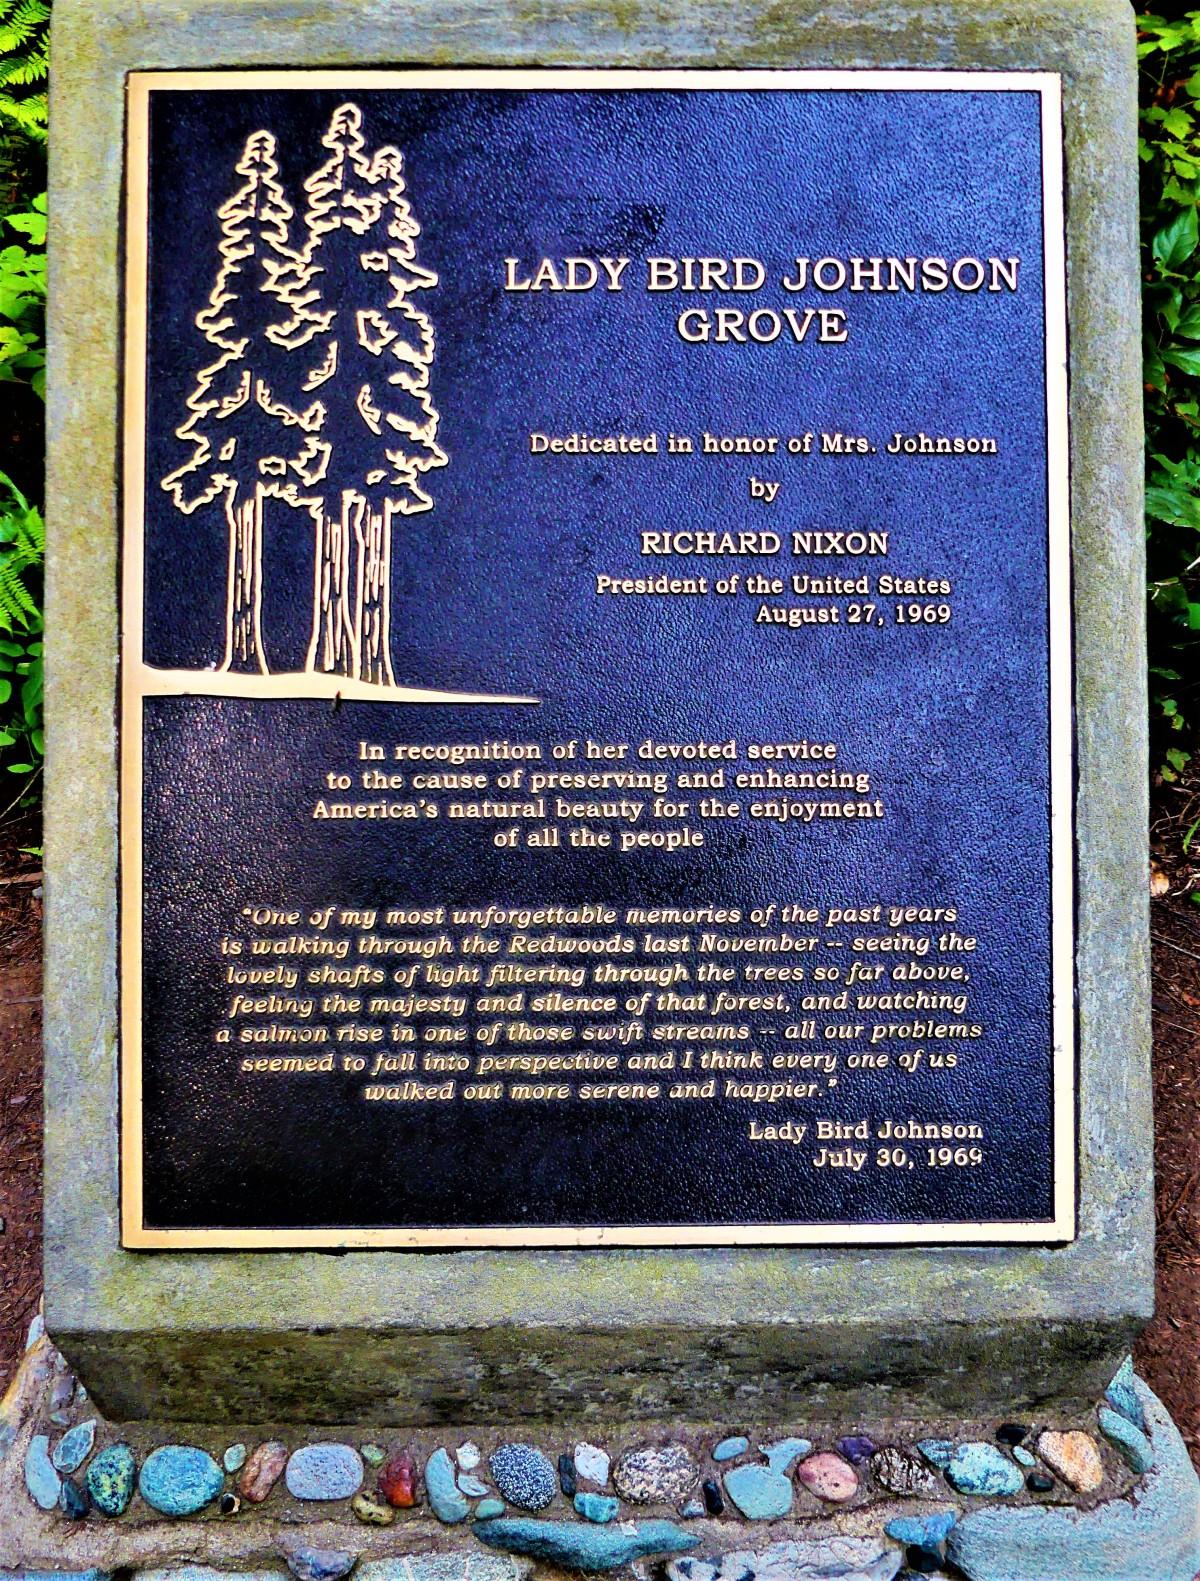 Lady Bird plaque